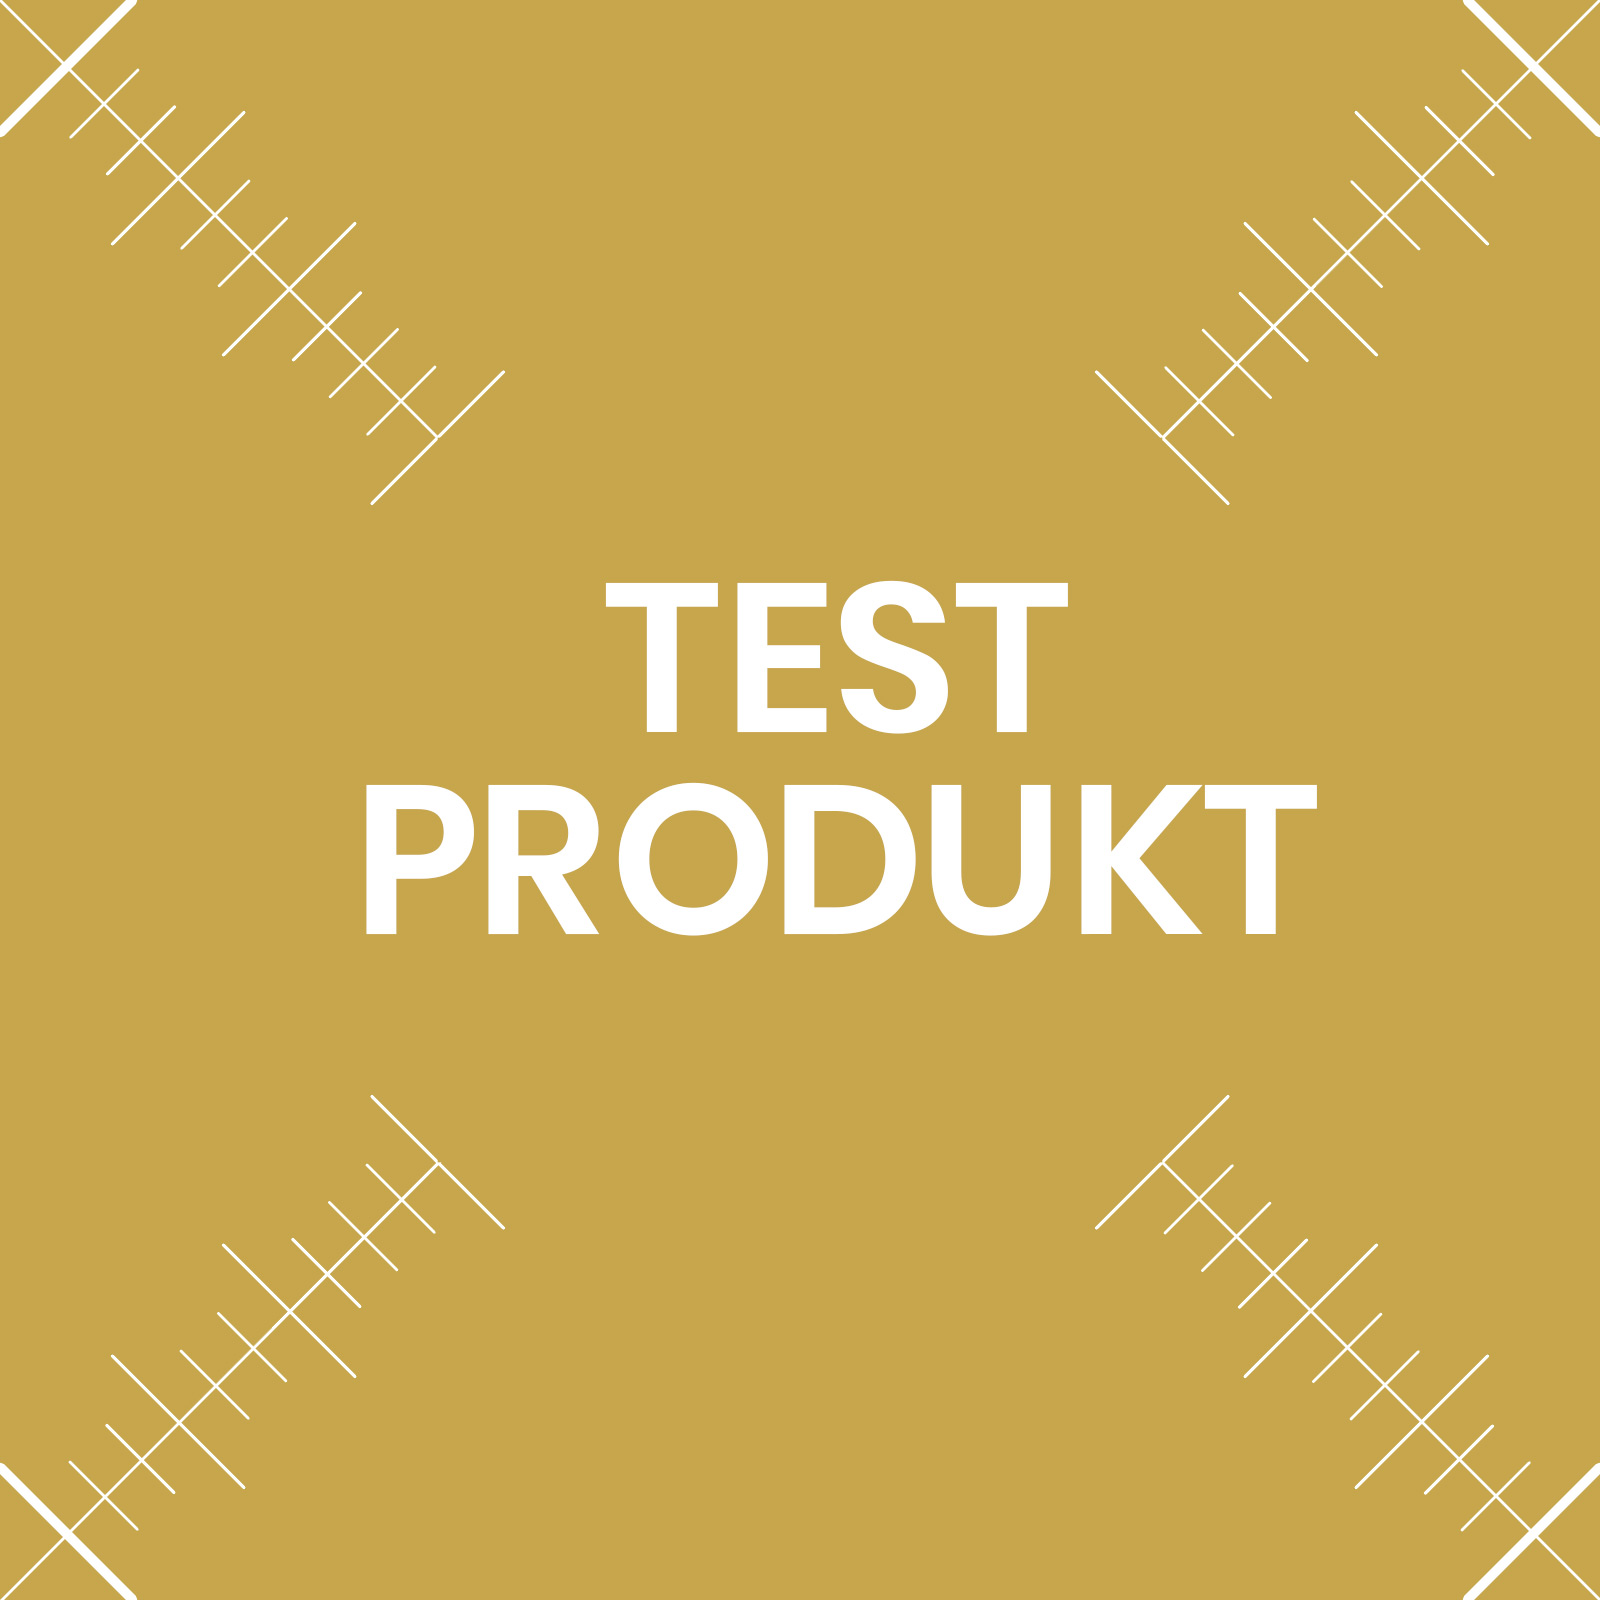 Testprodukt